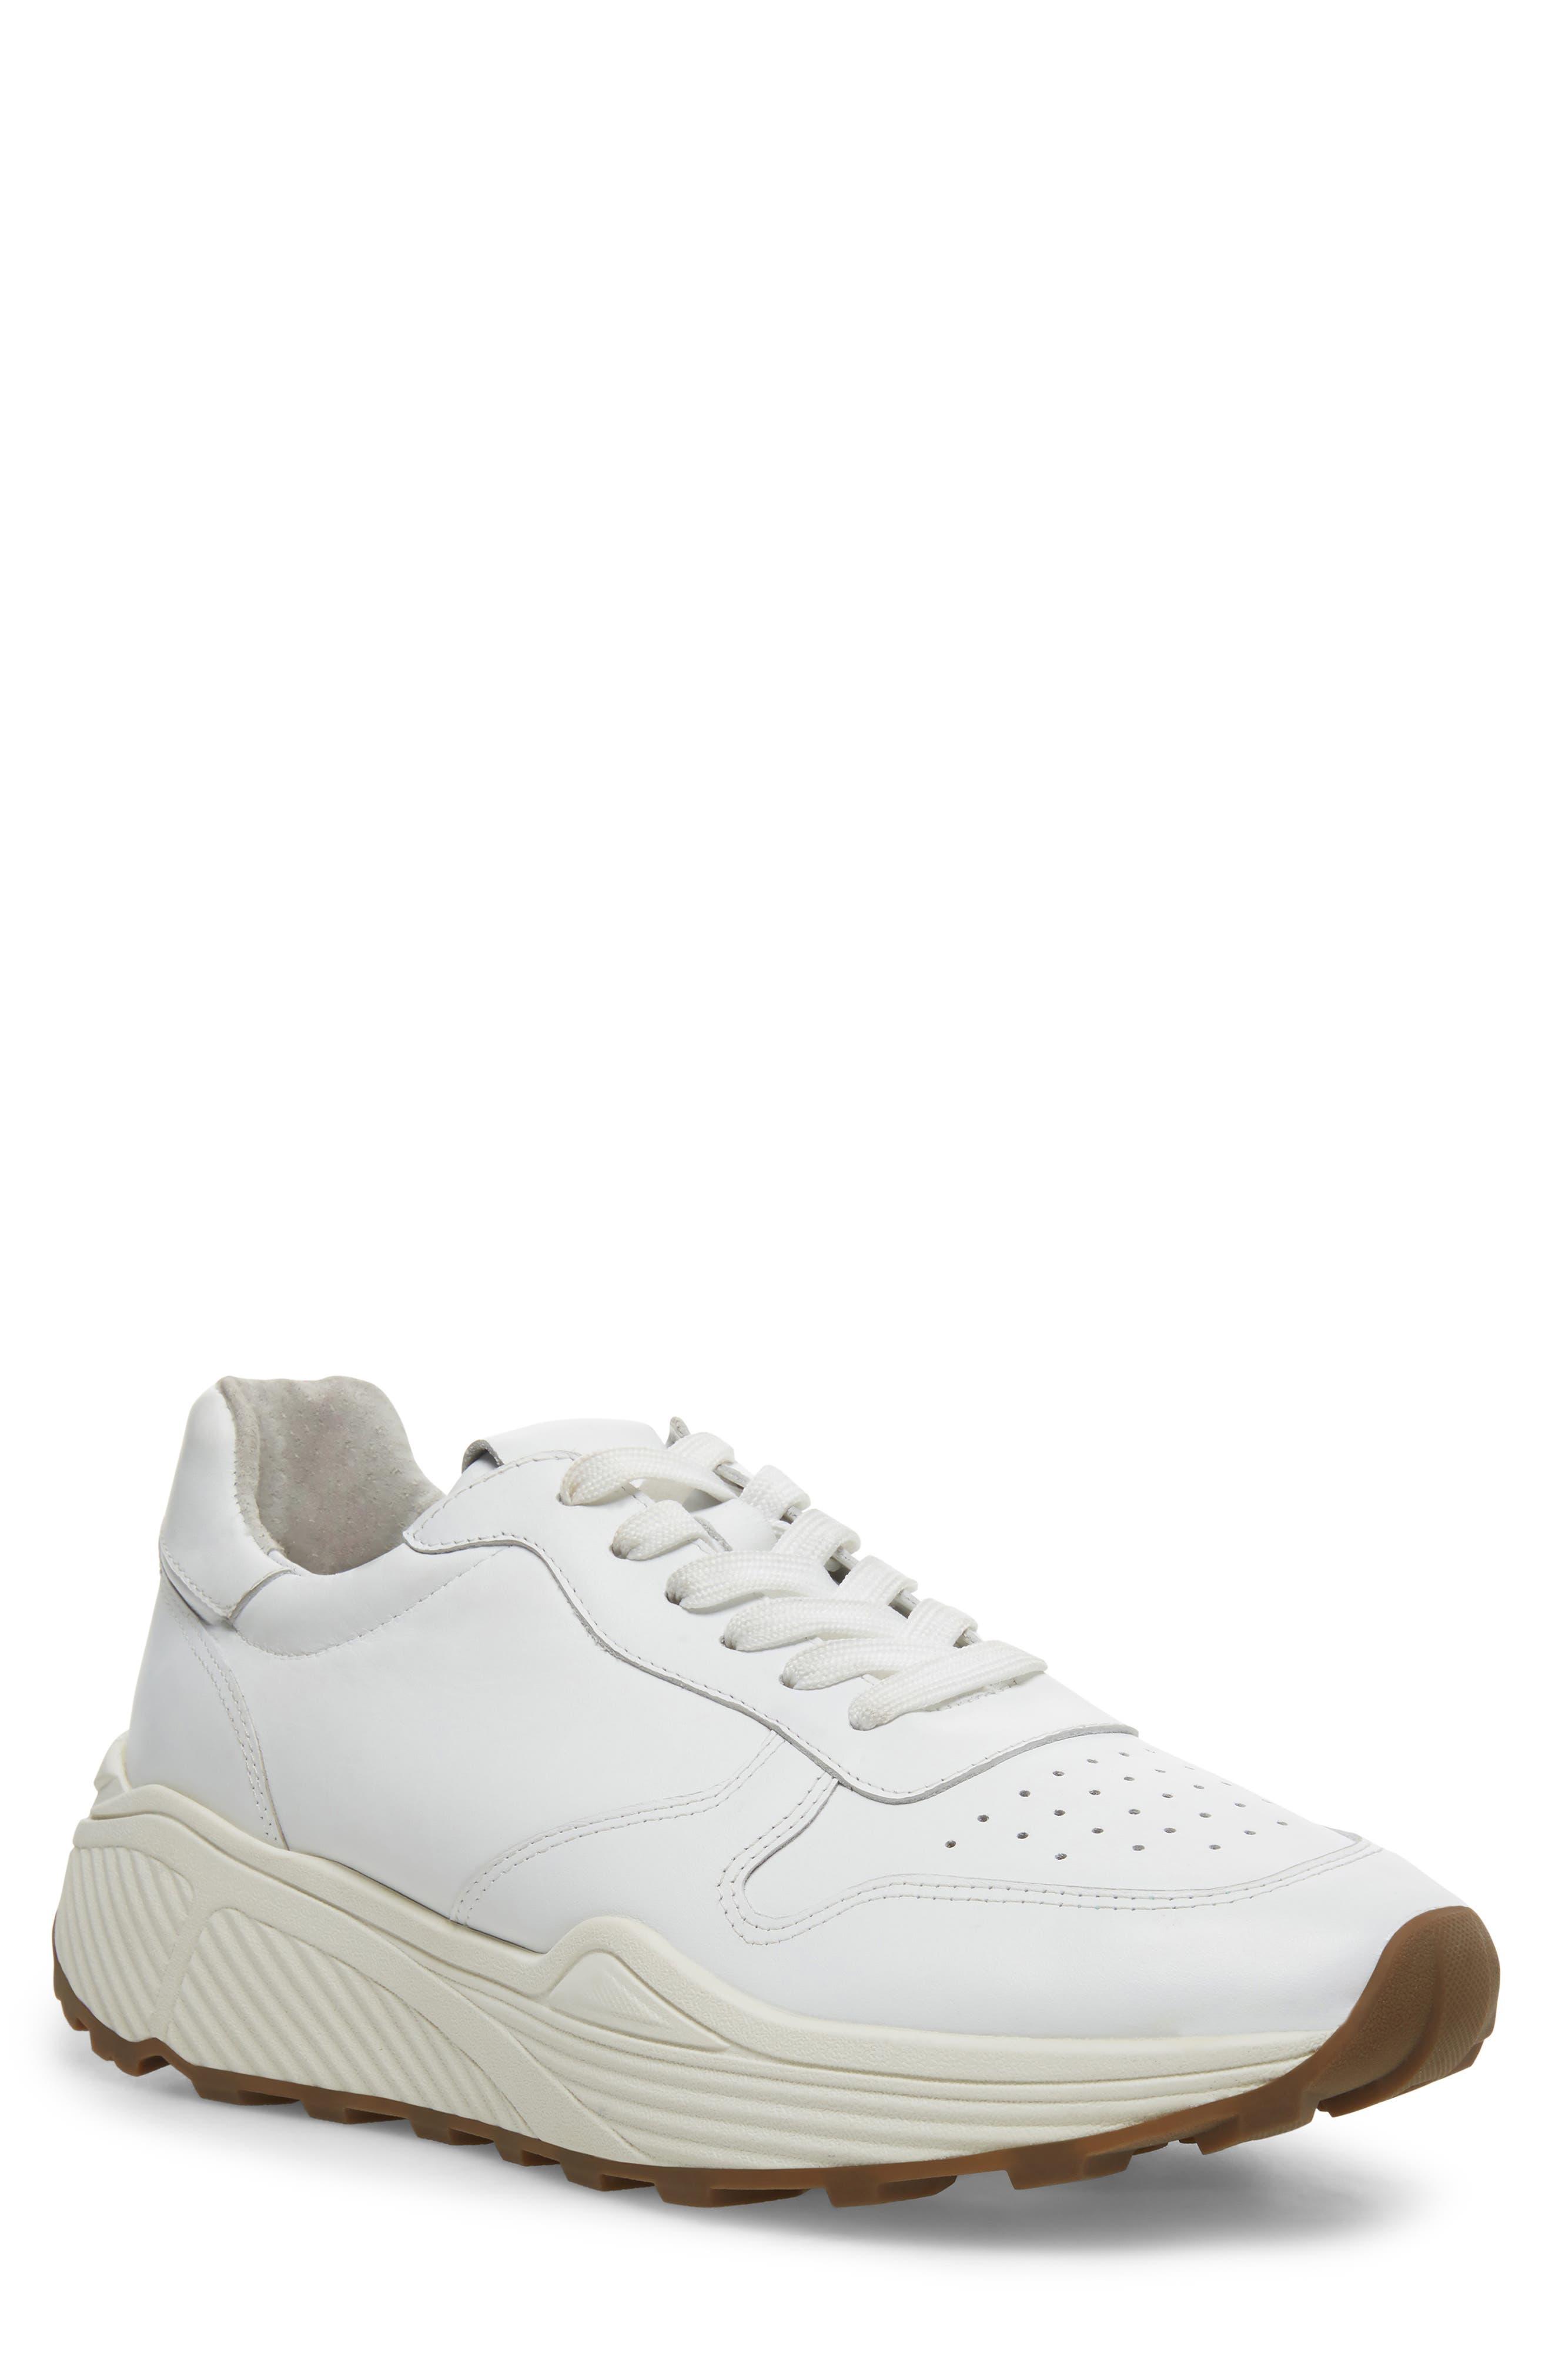 Steve Madden Shoes Sale \u0026 Clearance